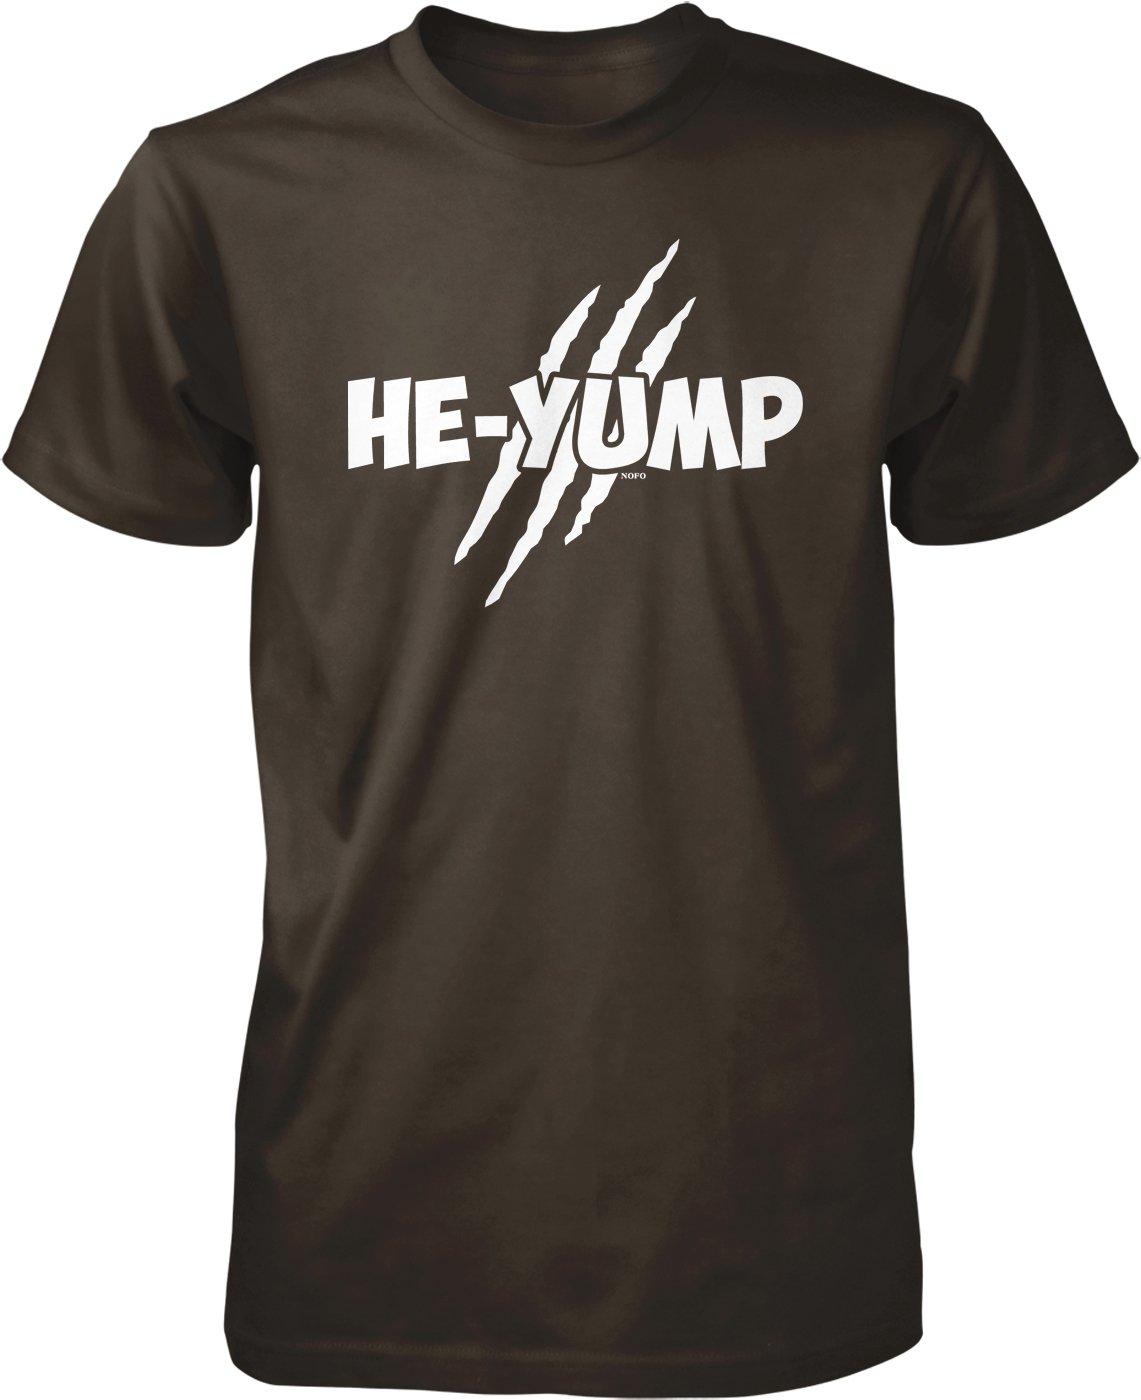 Heyump Werewolf Hunter S Tshirt